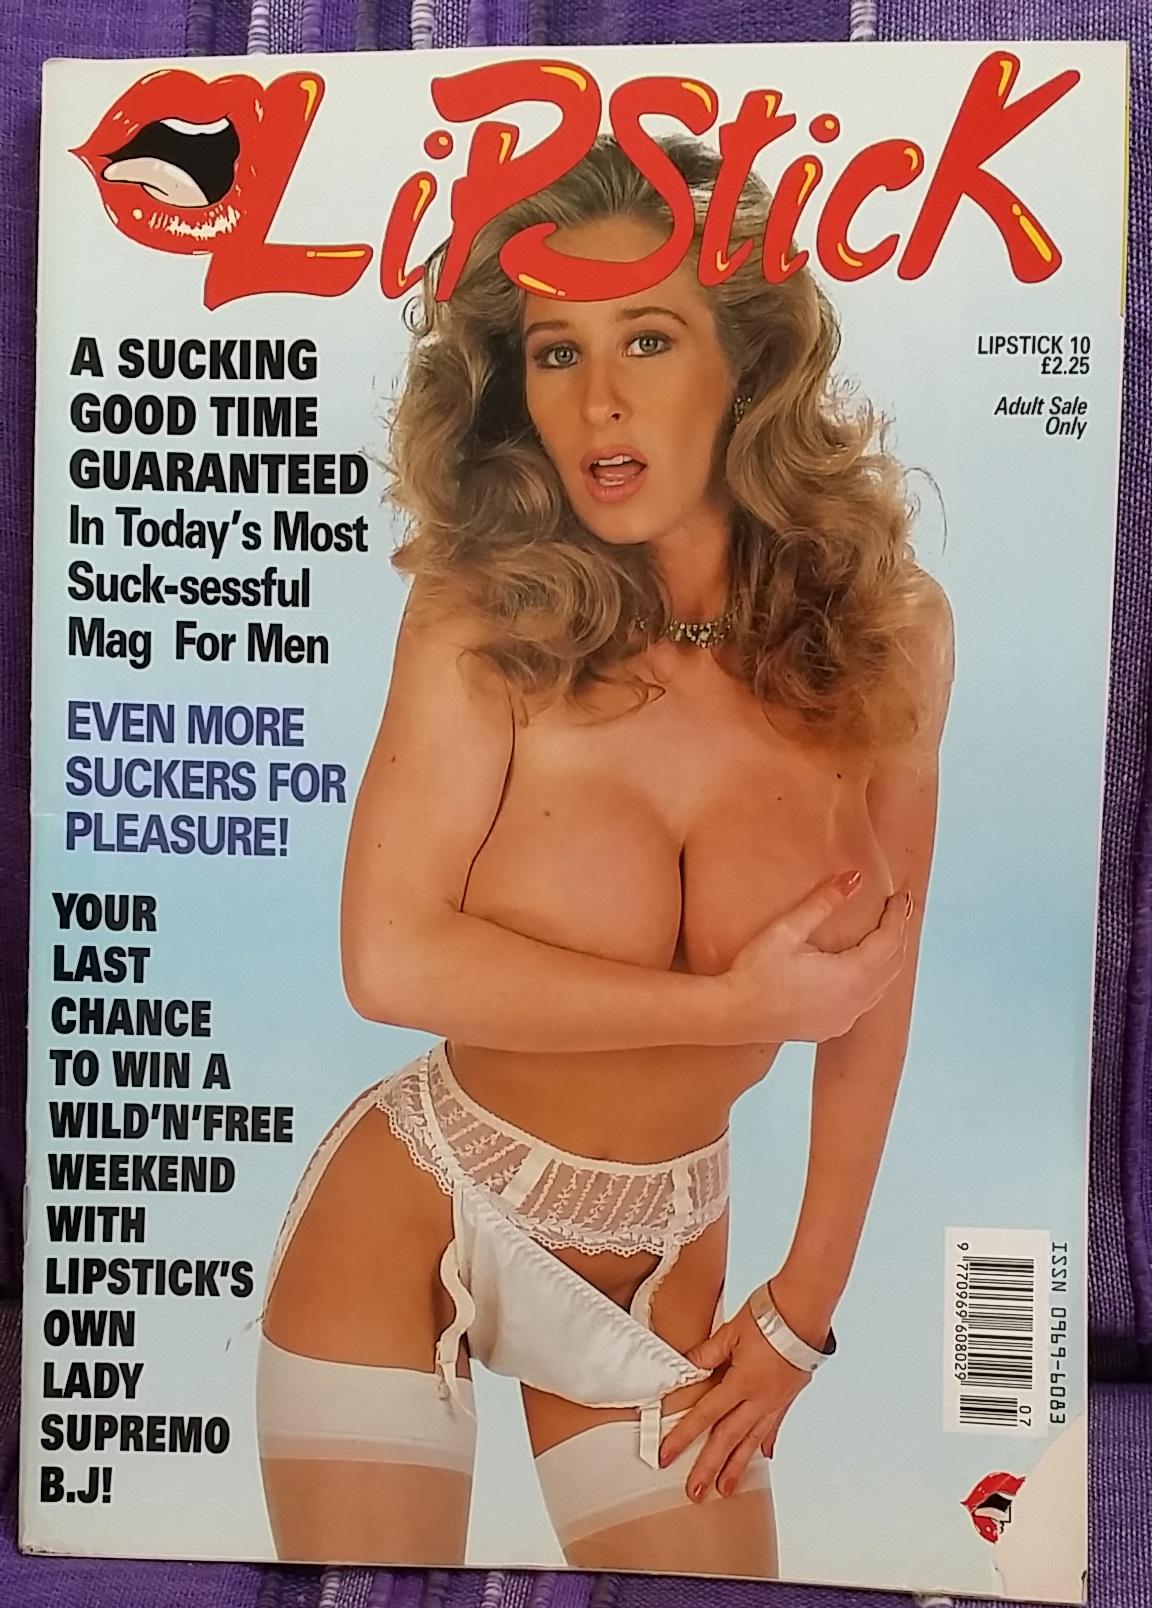 Tits vintage magazine apologise, but